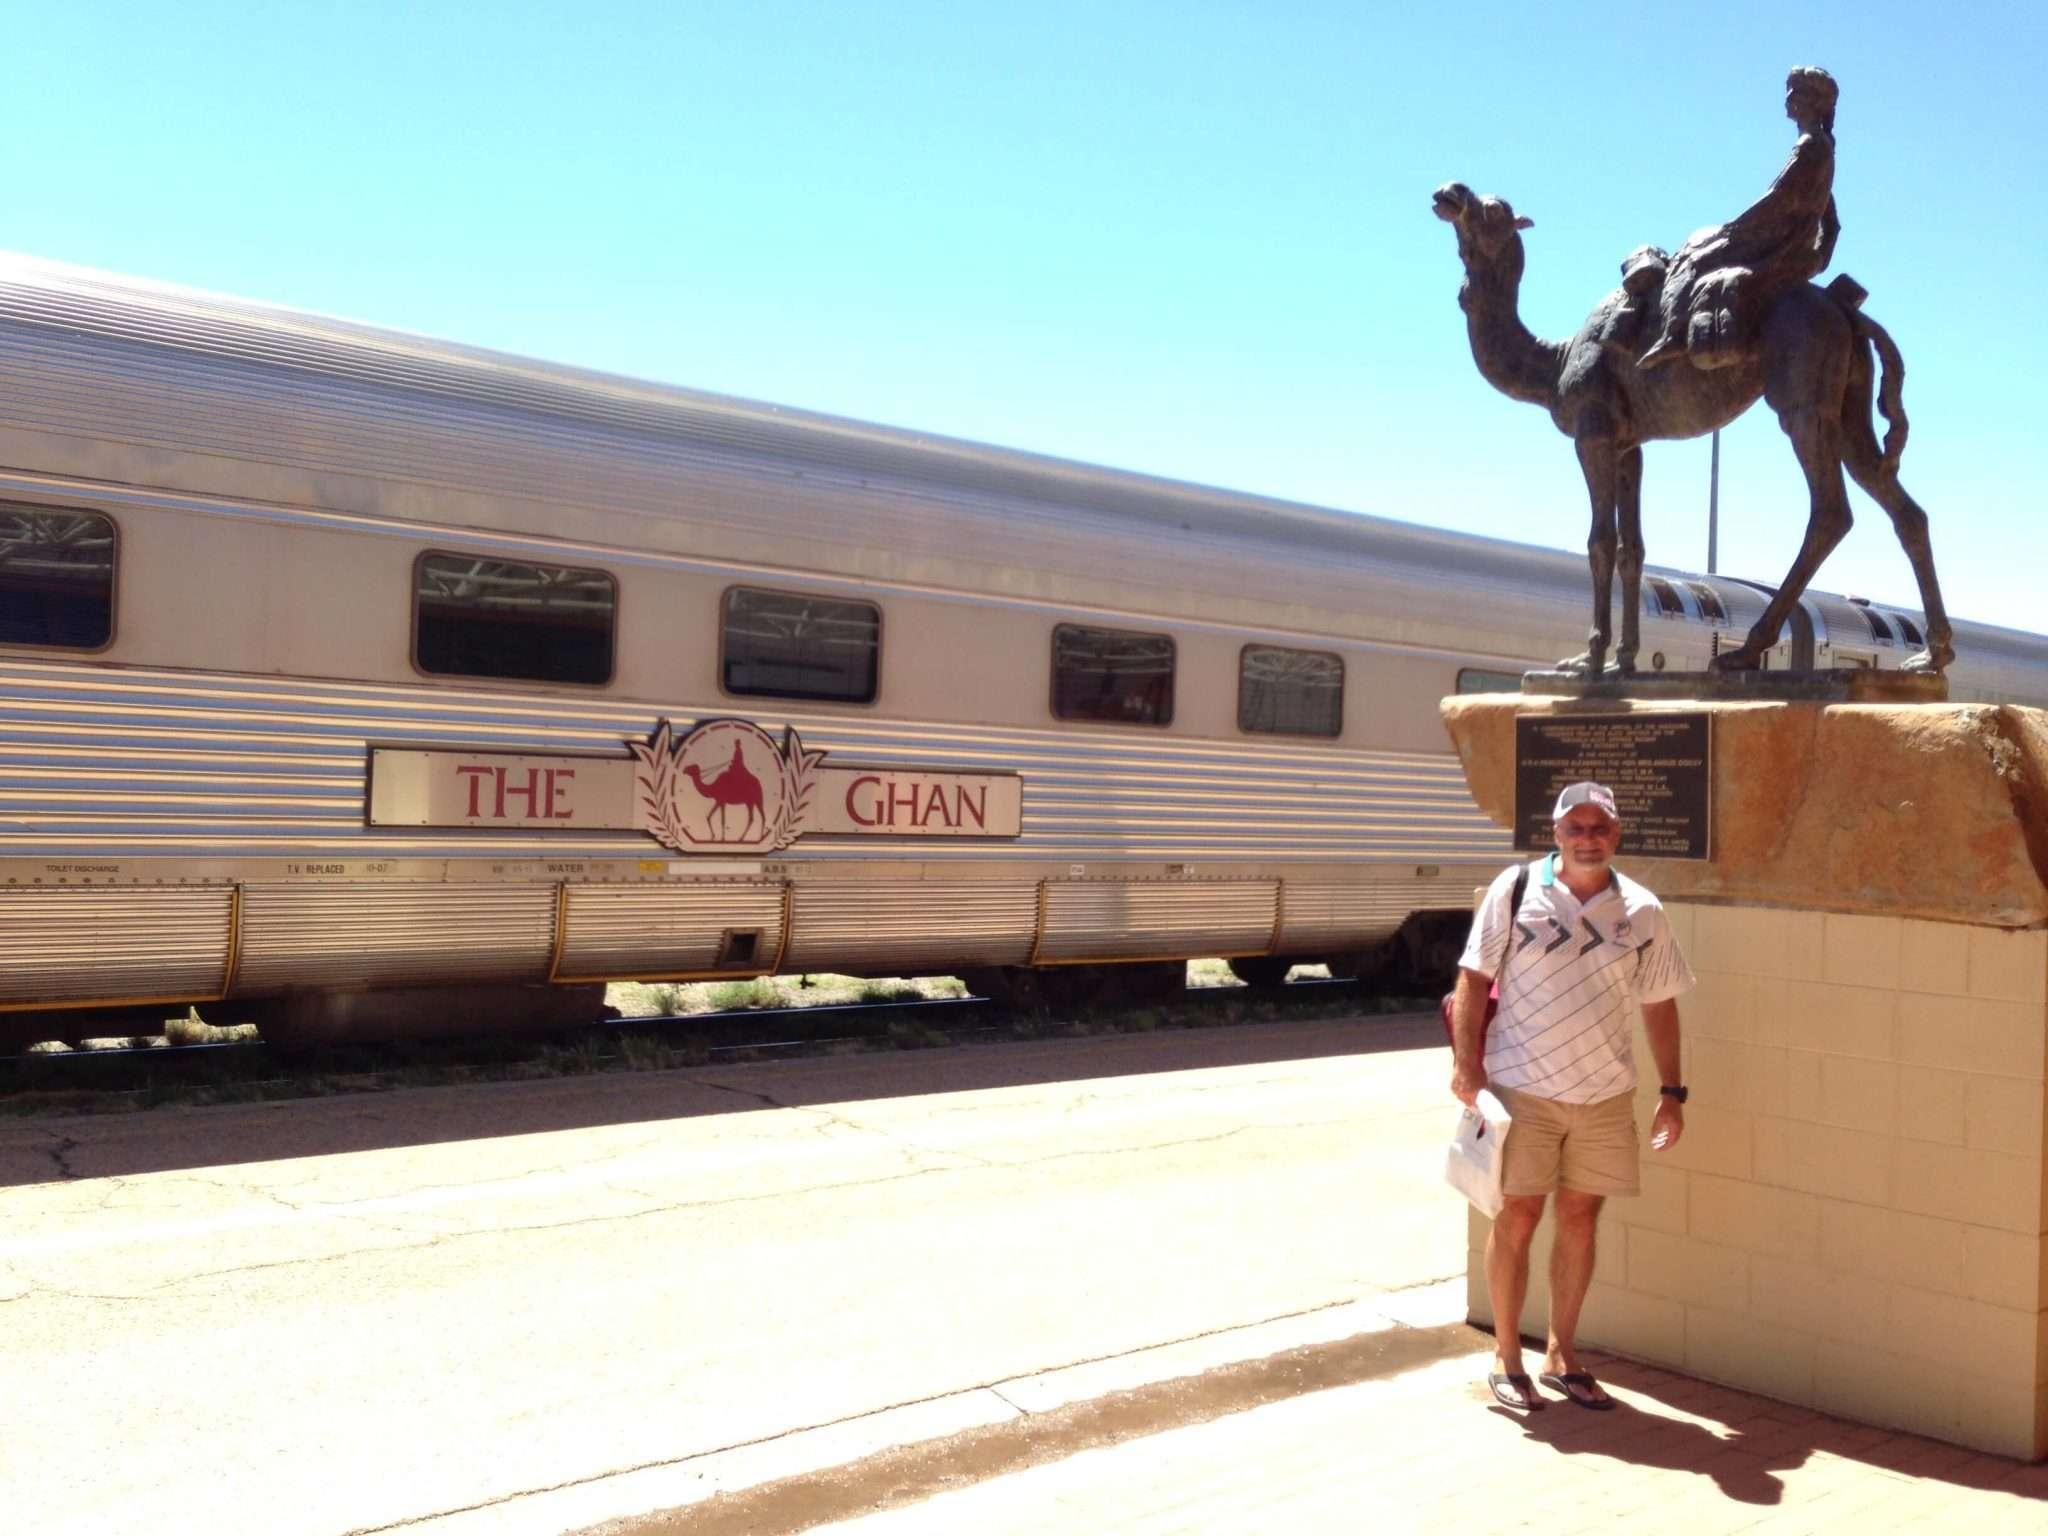 The Ghan Luxury Train In Australia ...